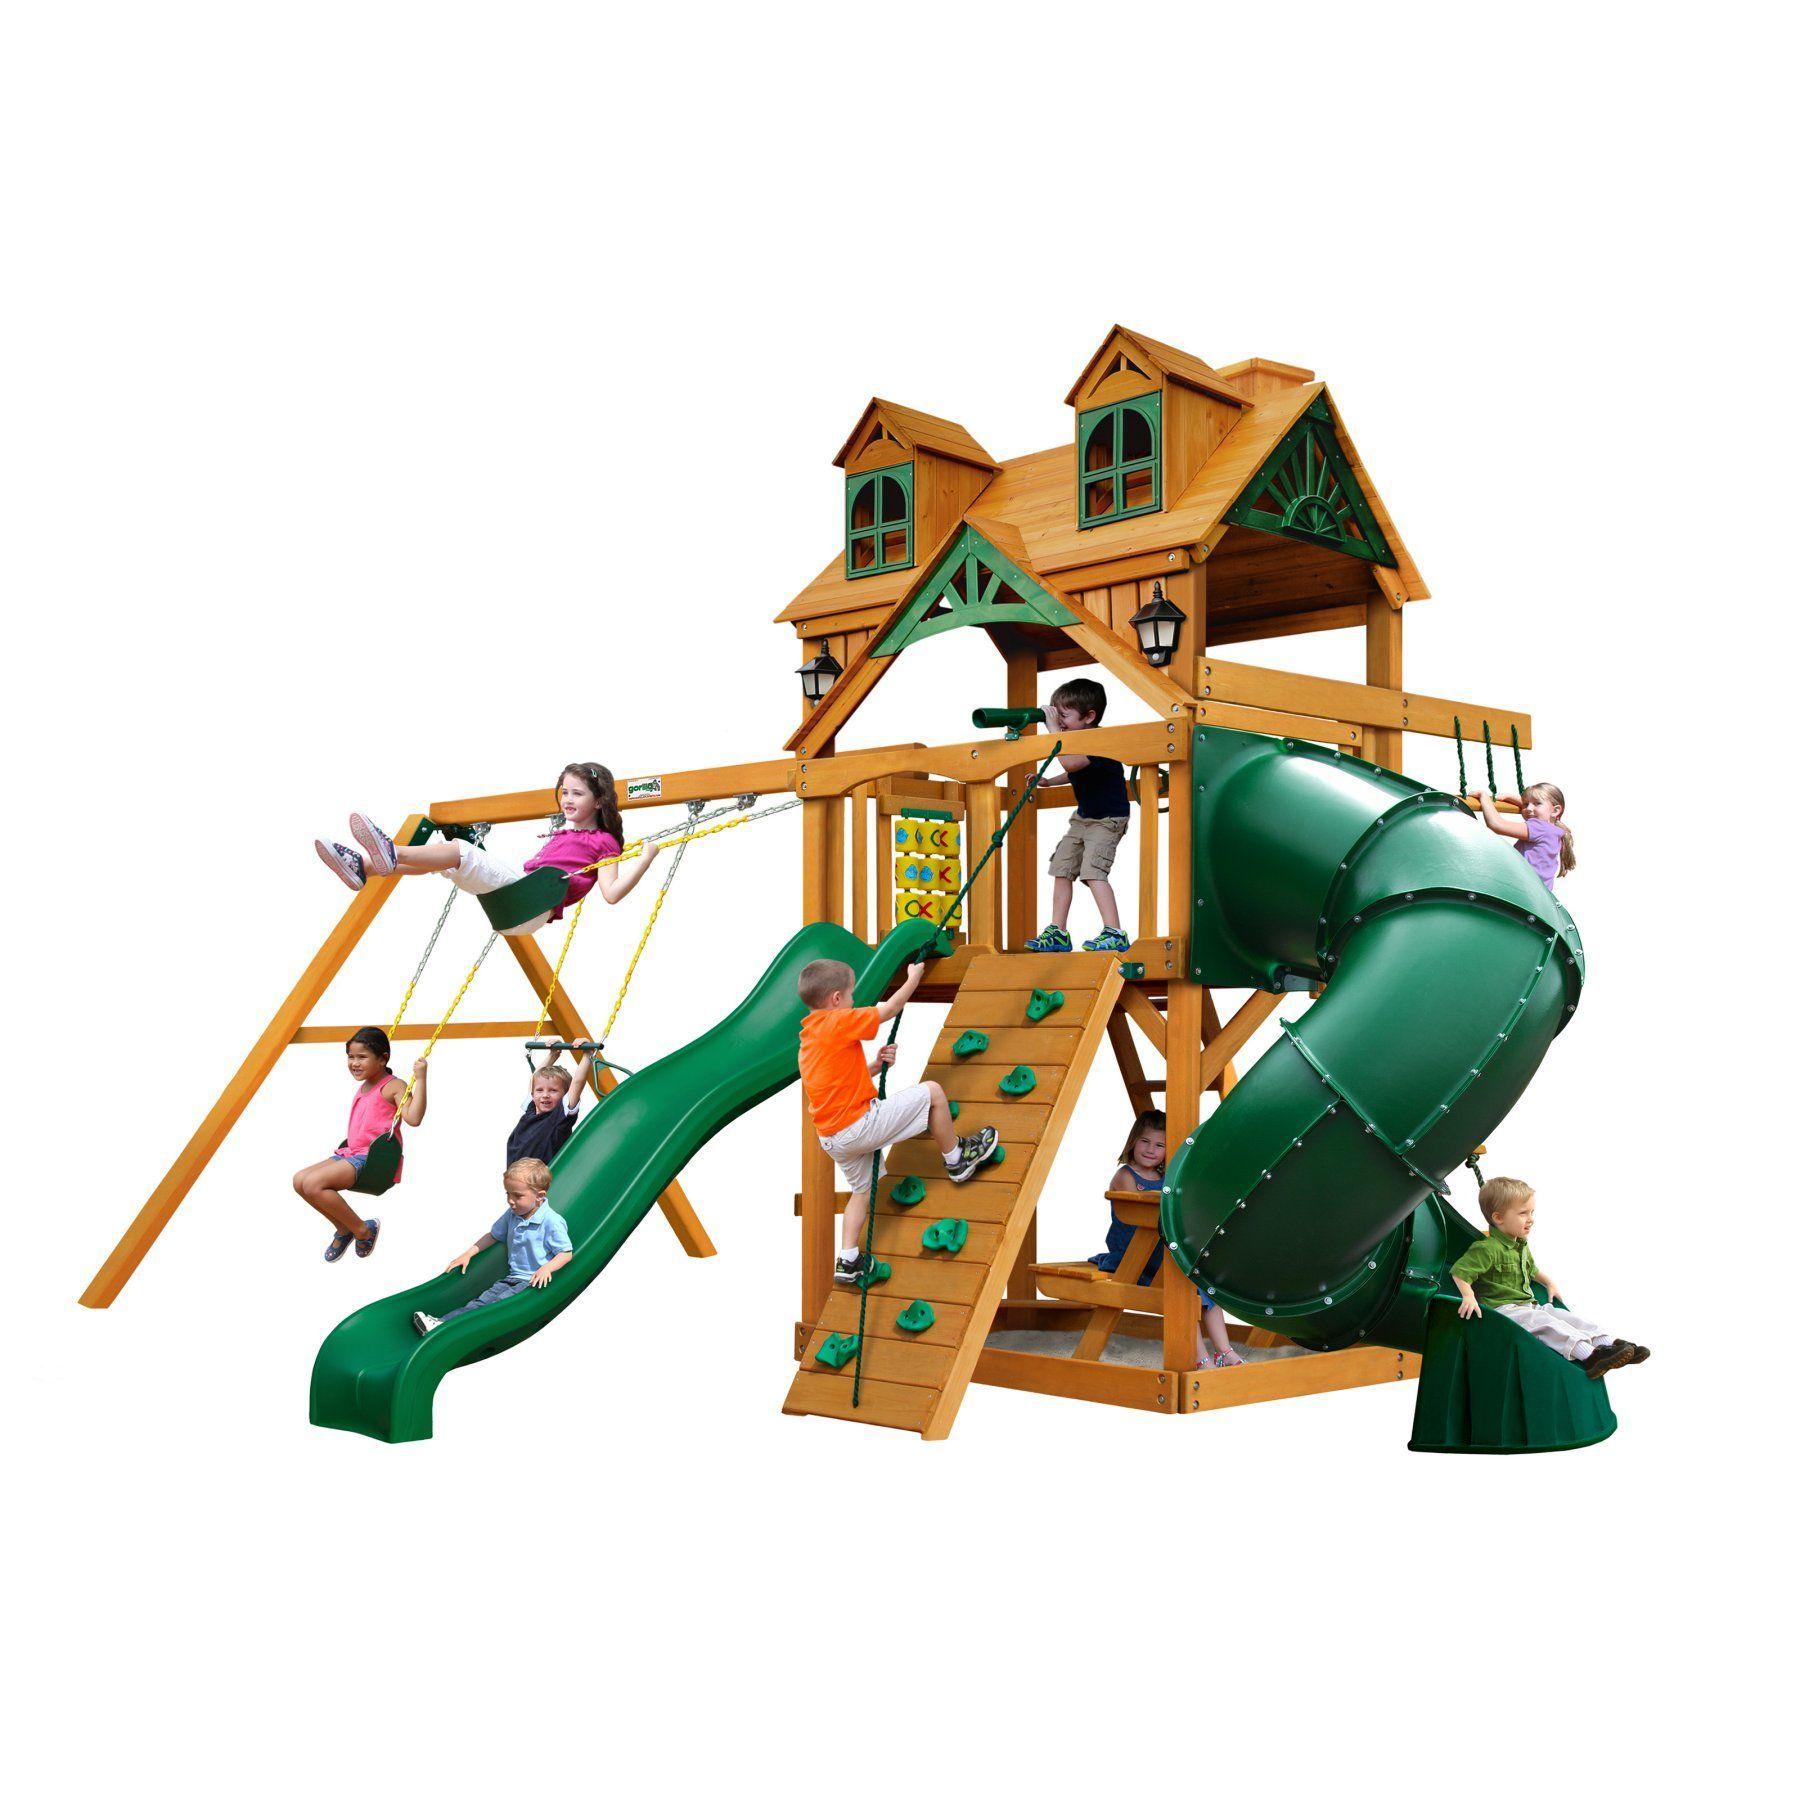 Gorilla Playsets Malibu Extreme Swing Set - 01-0046-AP